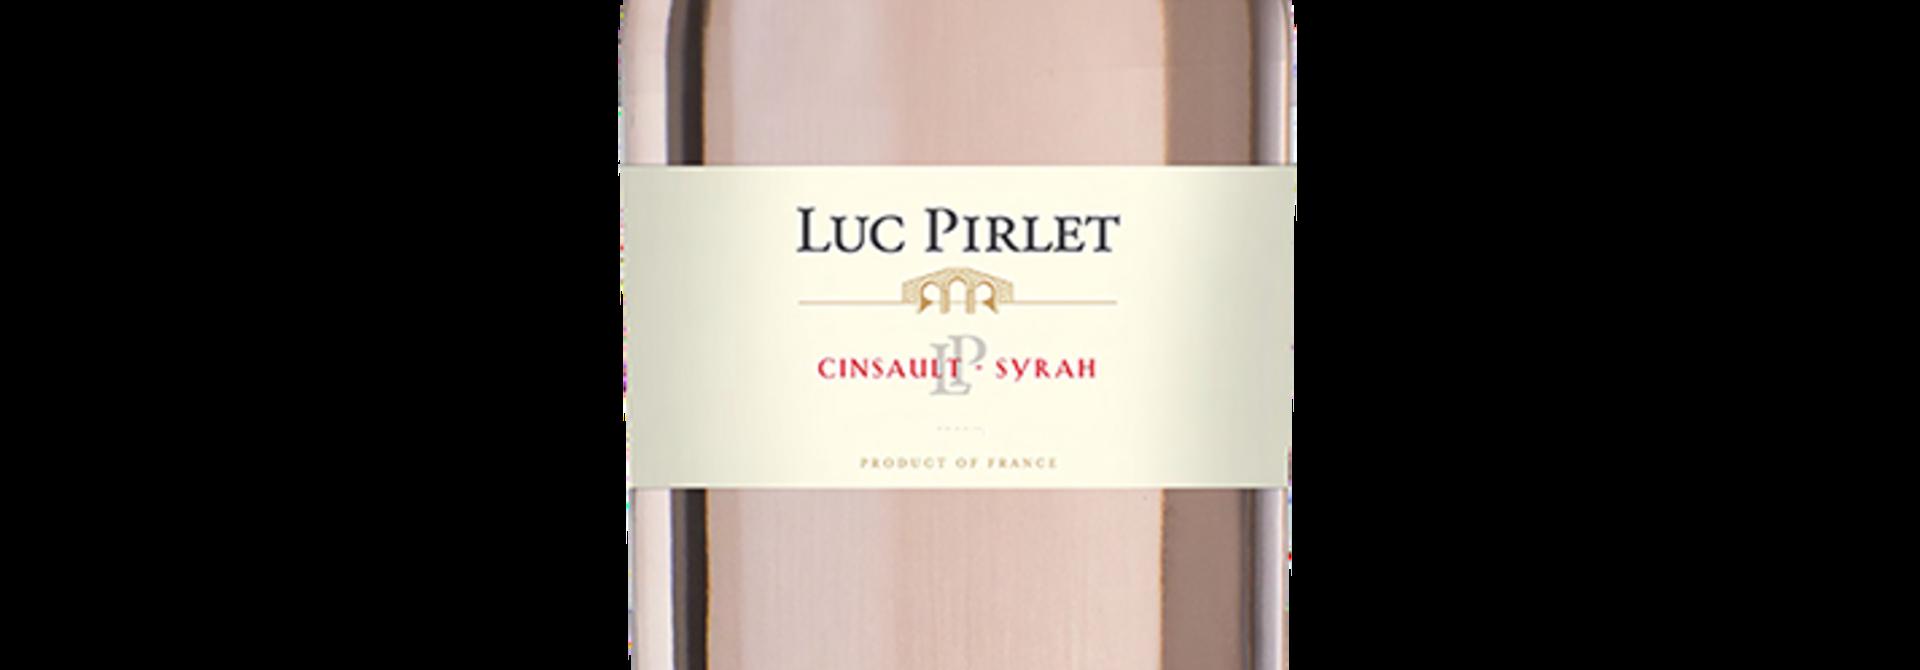 Bi-cepage Cinsault-Syrah Rose, Luc Pirlet